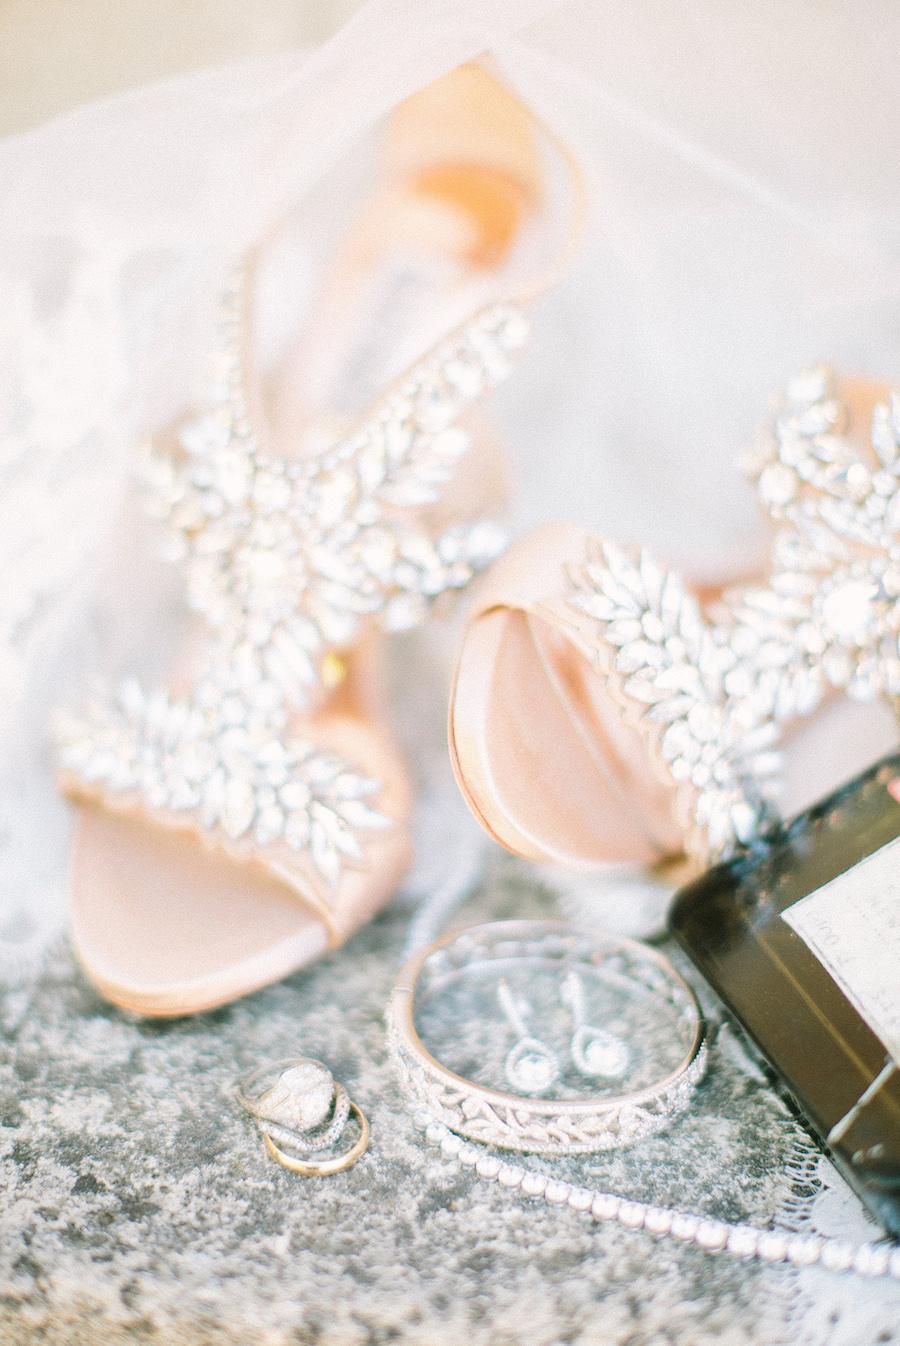 saya-photography-jewish-wedding-provence-rustic-lourmarin-le-galinier-21.jpg